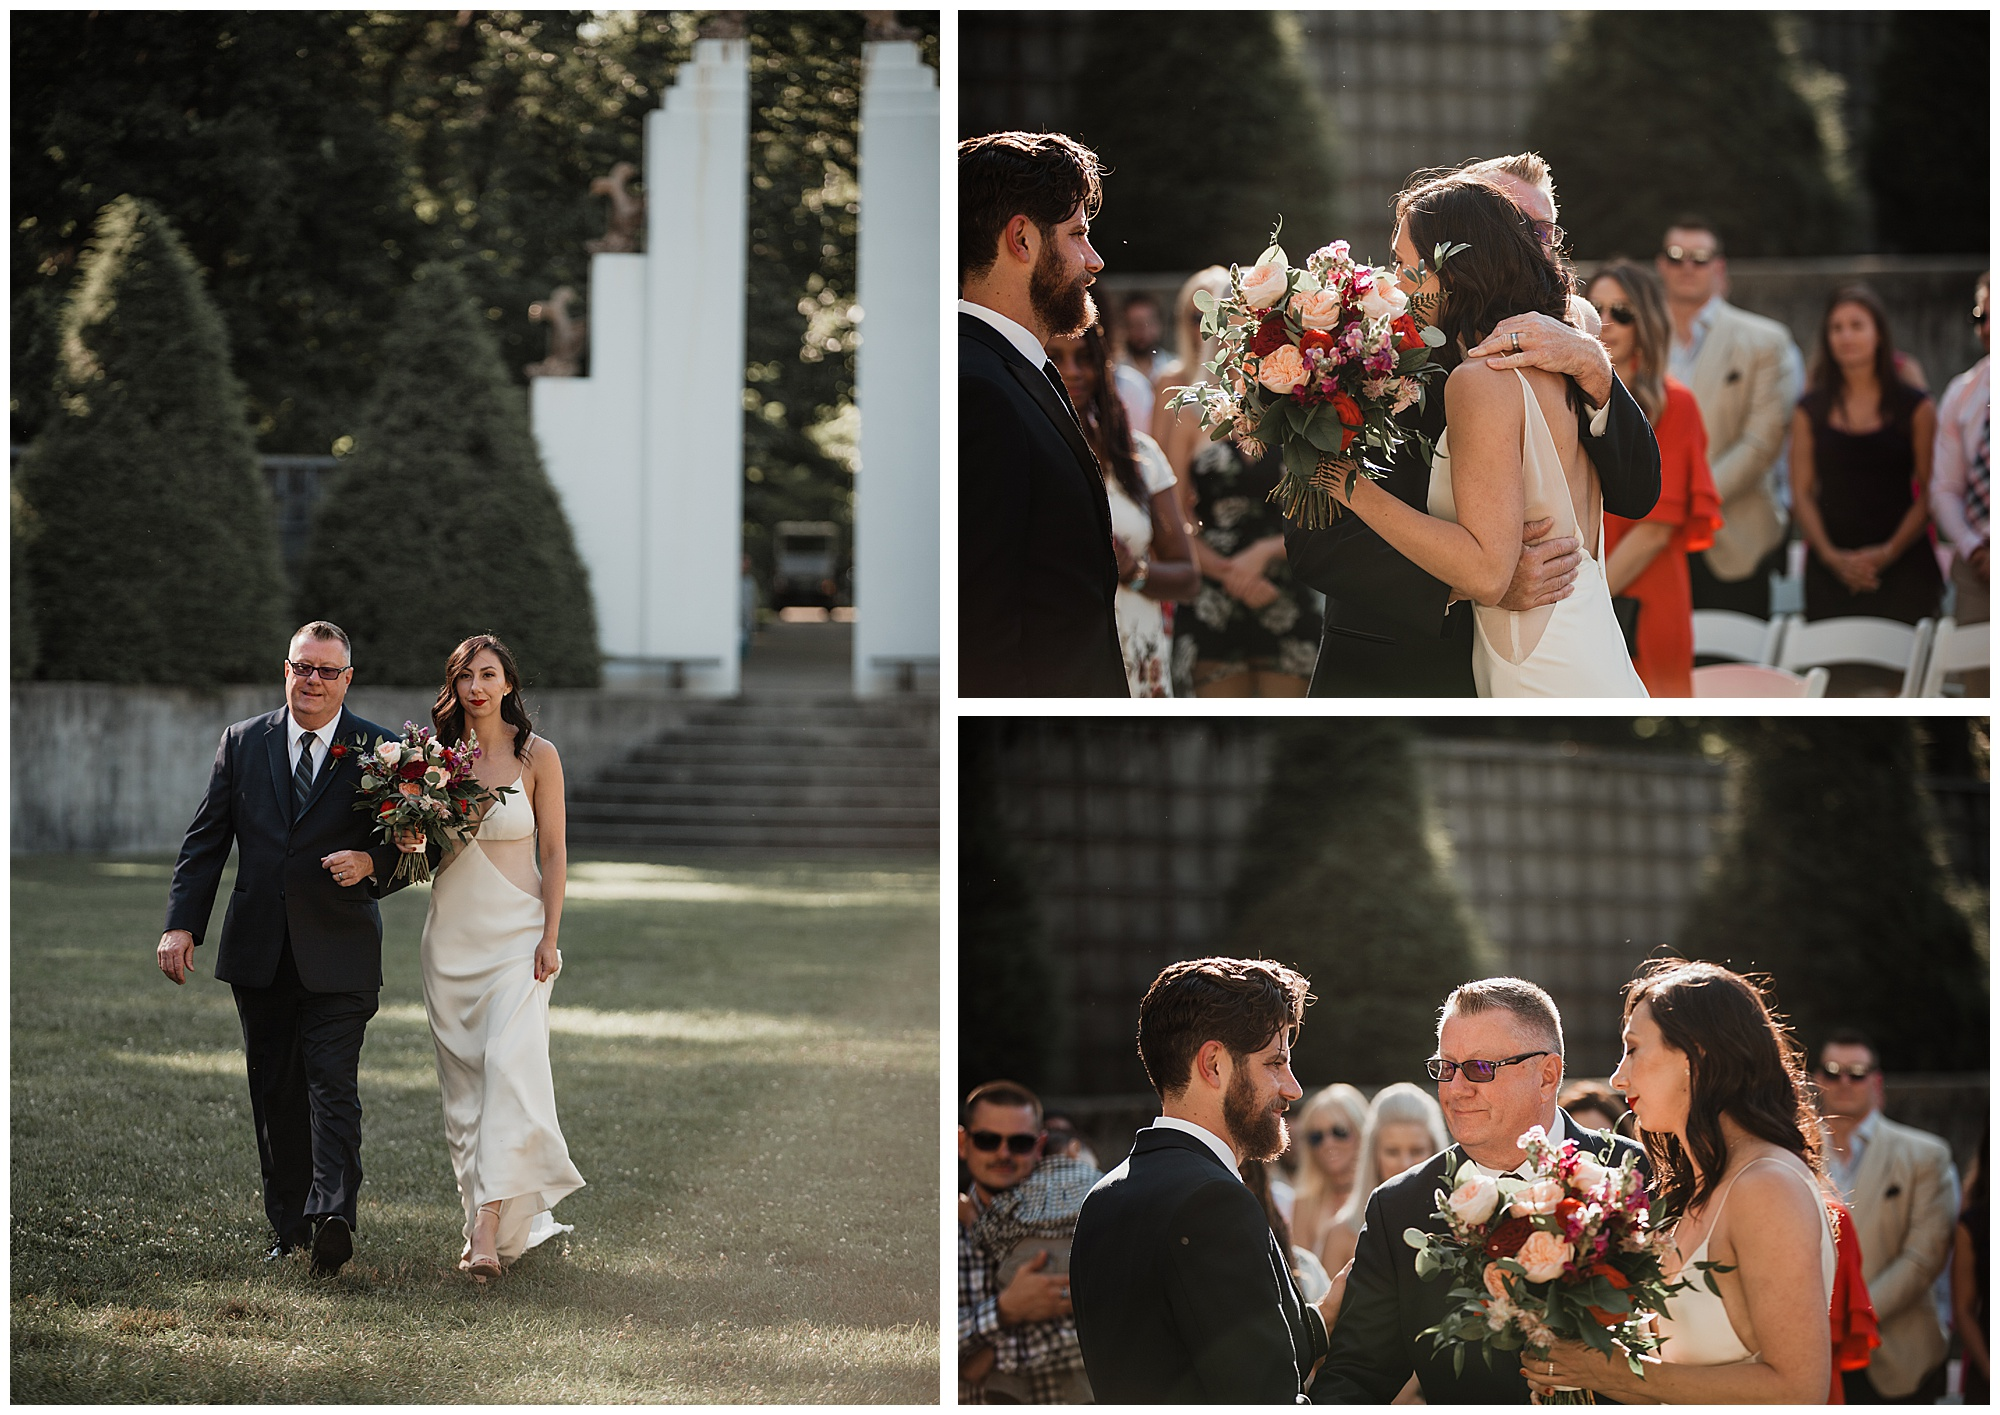 allerton_park_wedding_champaign_il_chicago_wright_photographs_ne_0029.jpg